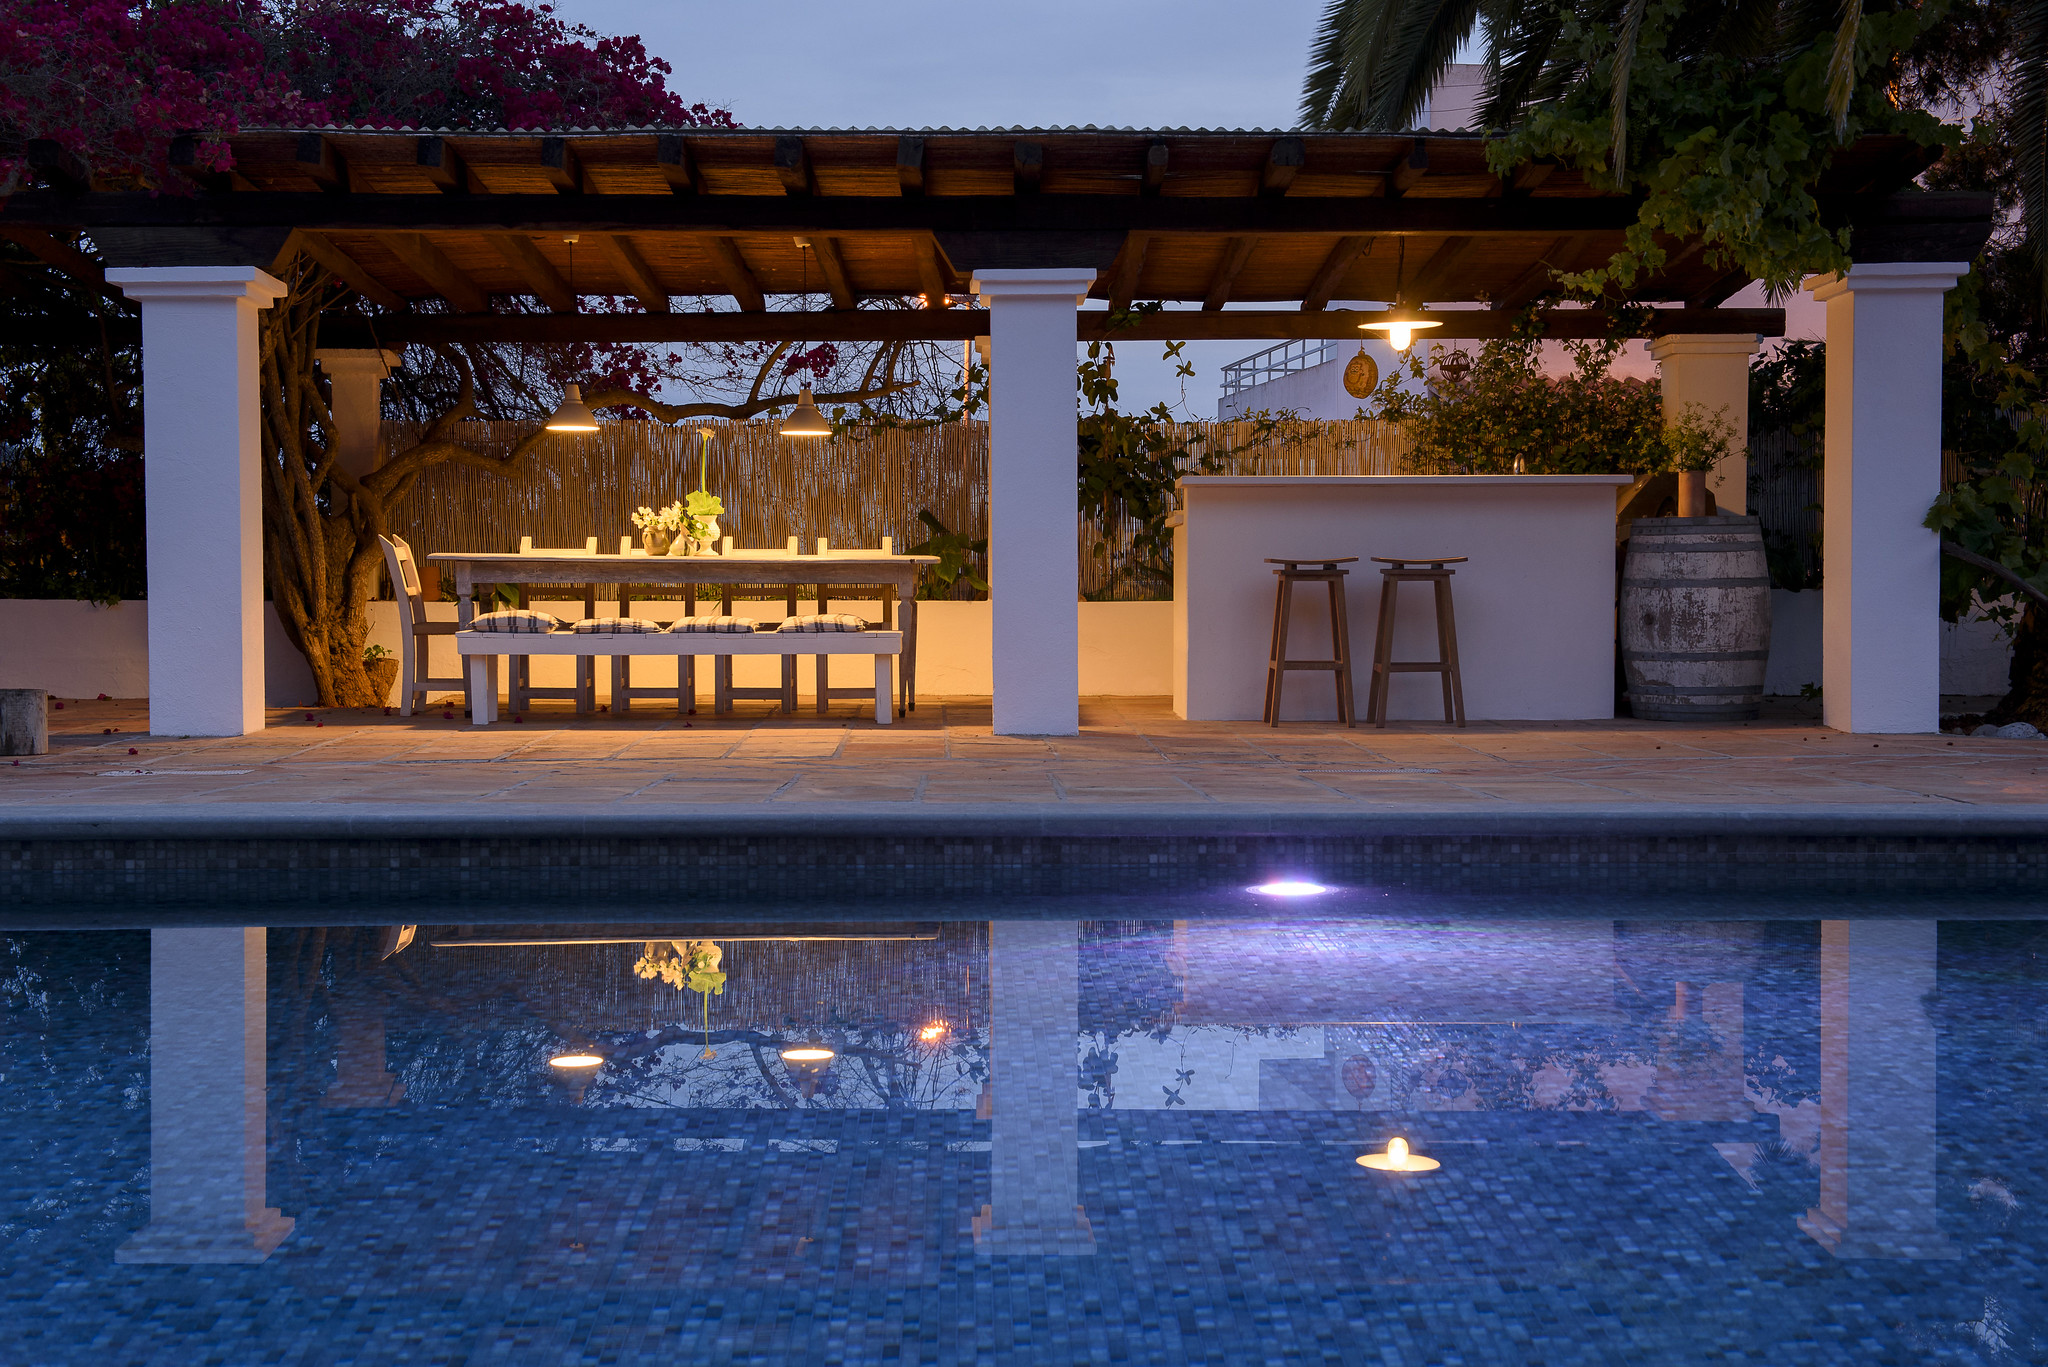 https://www.white-ibiza.com/wp-content/uploads/2020/05/white-ibiza-villas-can-lyra-exterior-pool-bar.jpg